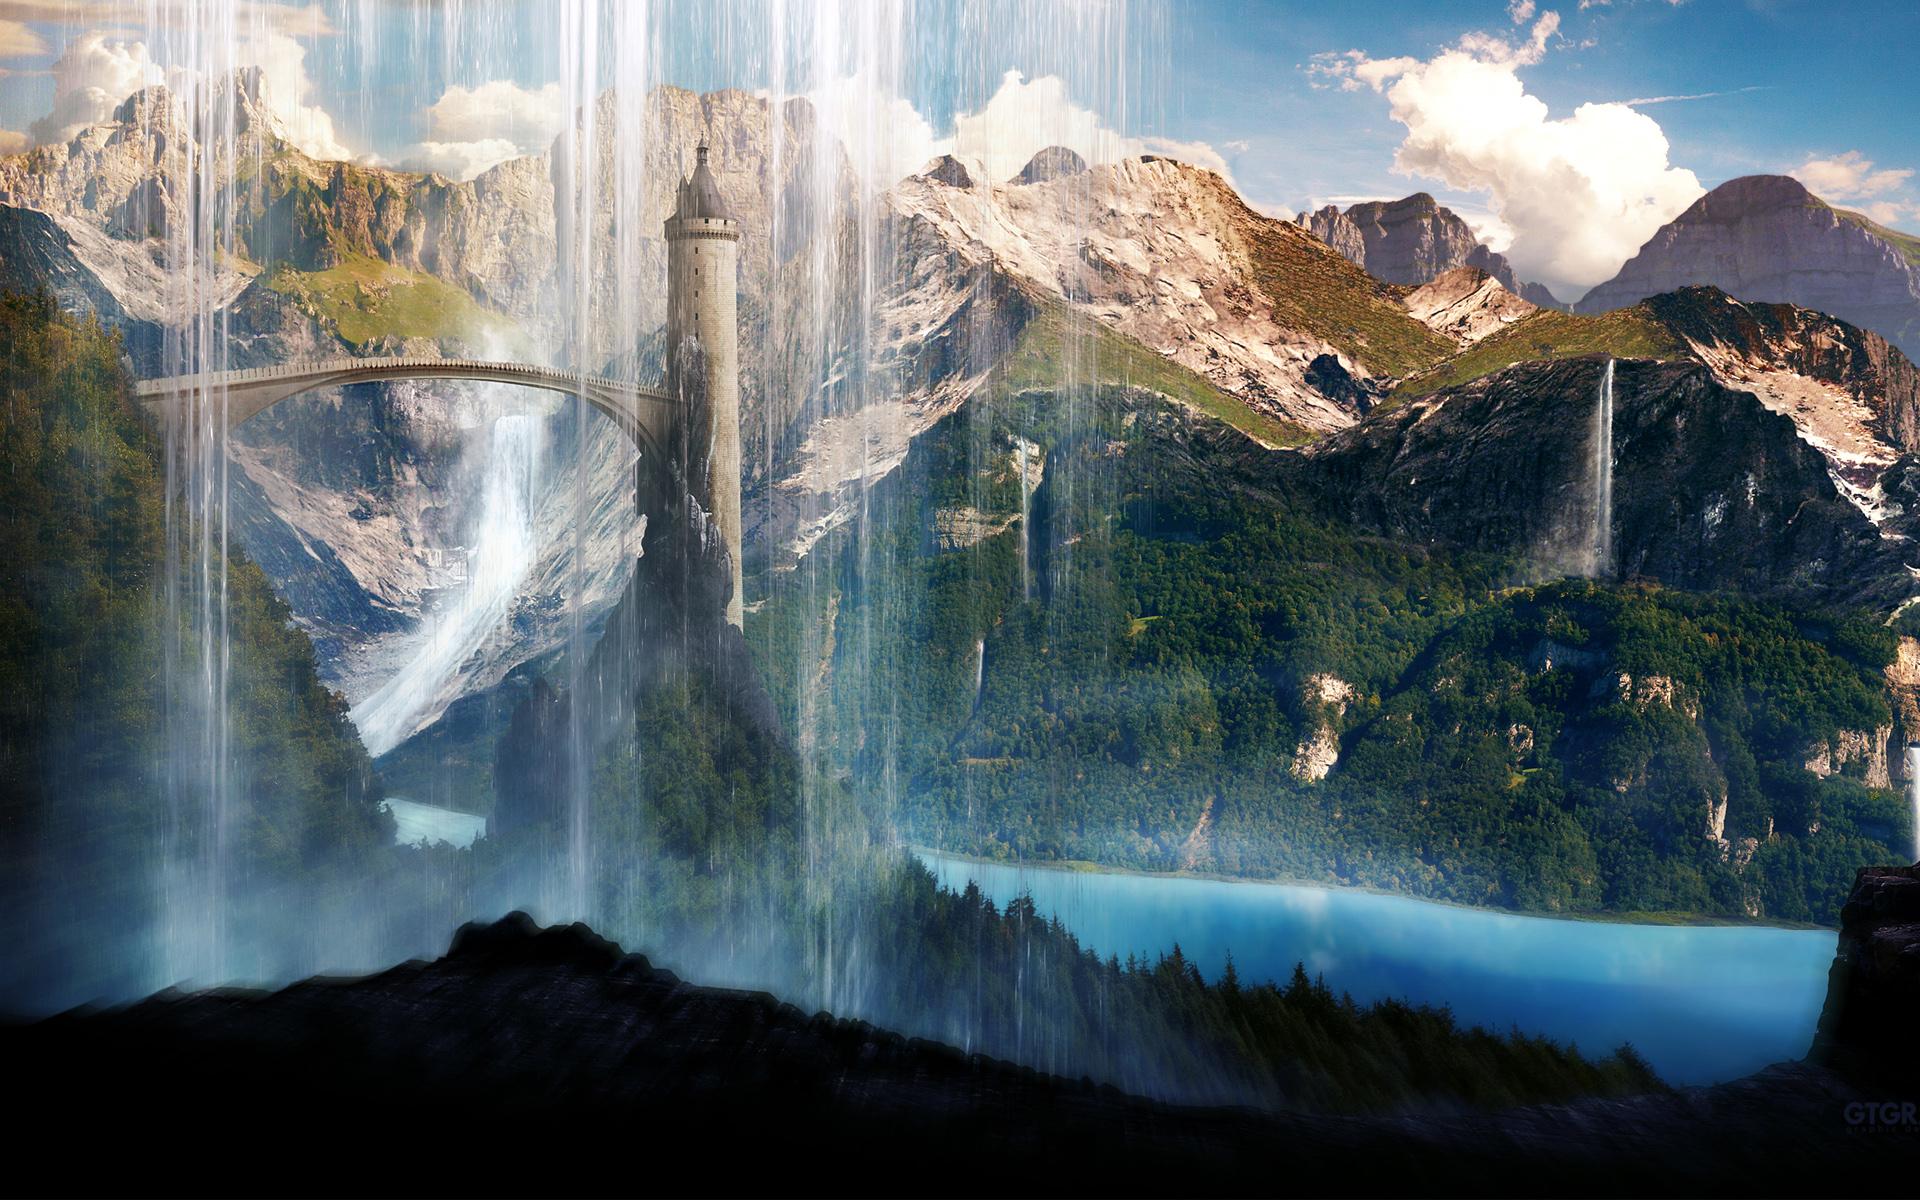 Live Niagara Falls Wallpaper Waterfalls Scenery Wallpapers Hd Wallpapers Id 12569